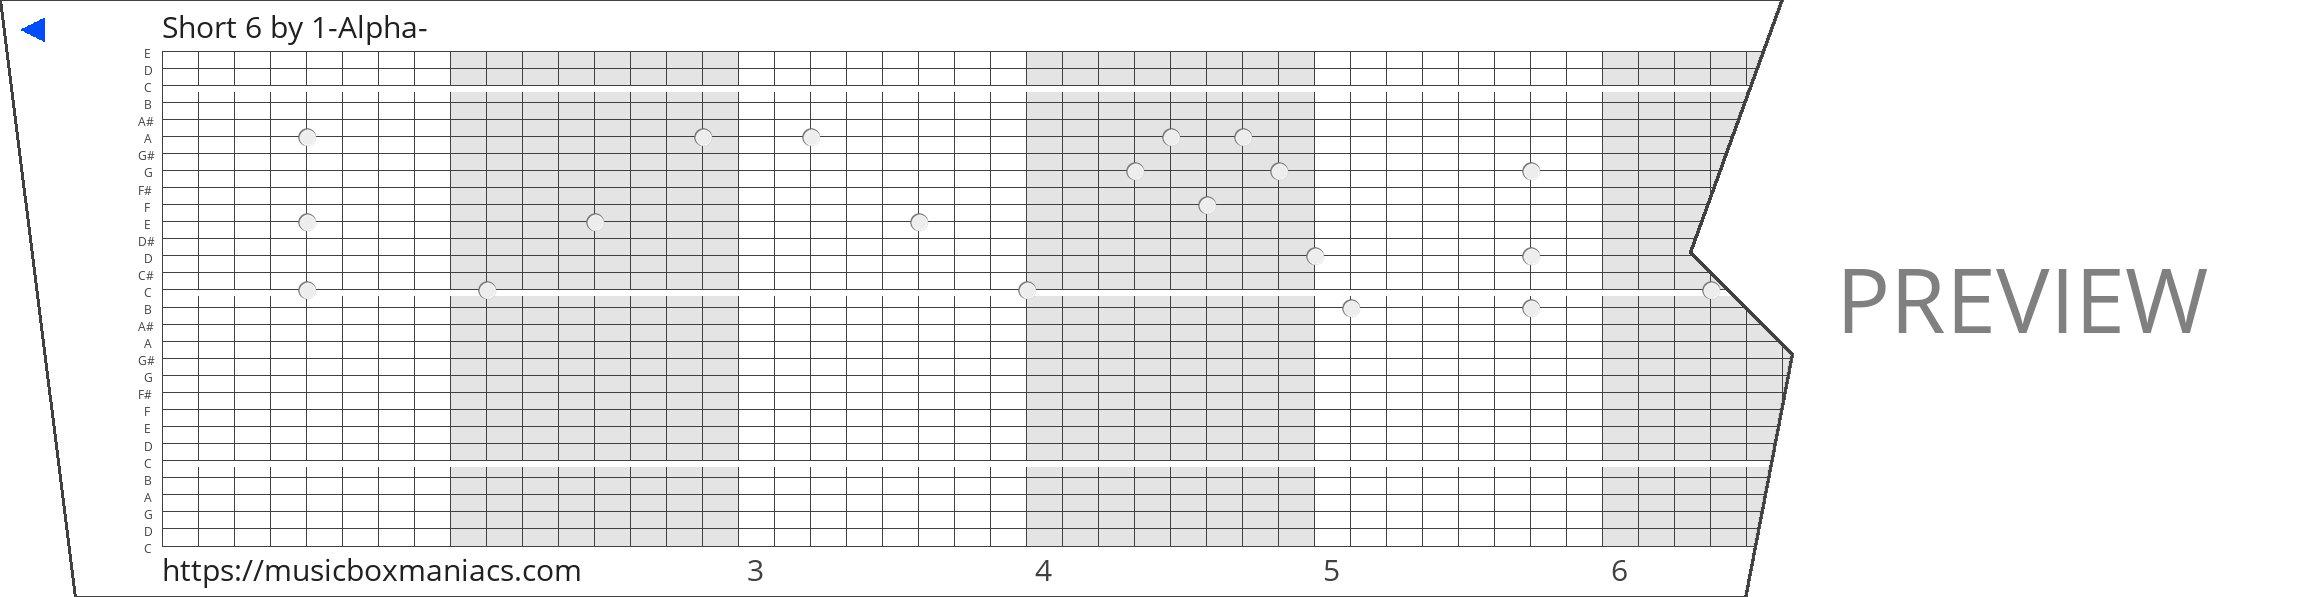 Short 6 30 note music box paper strip